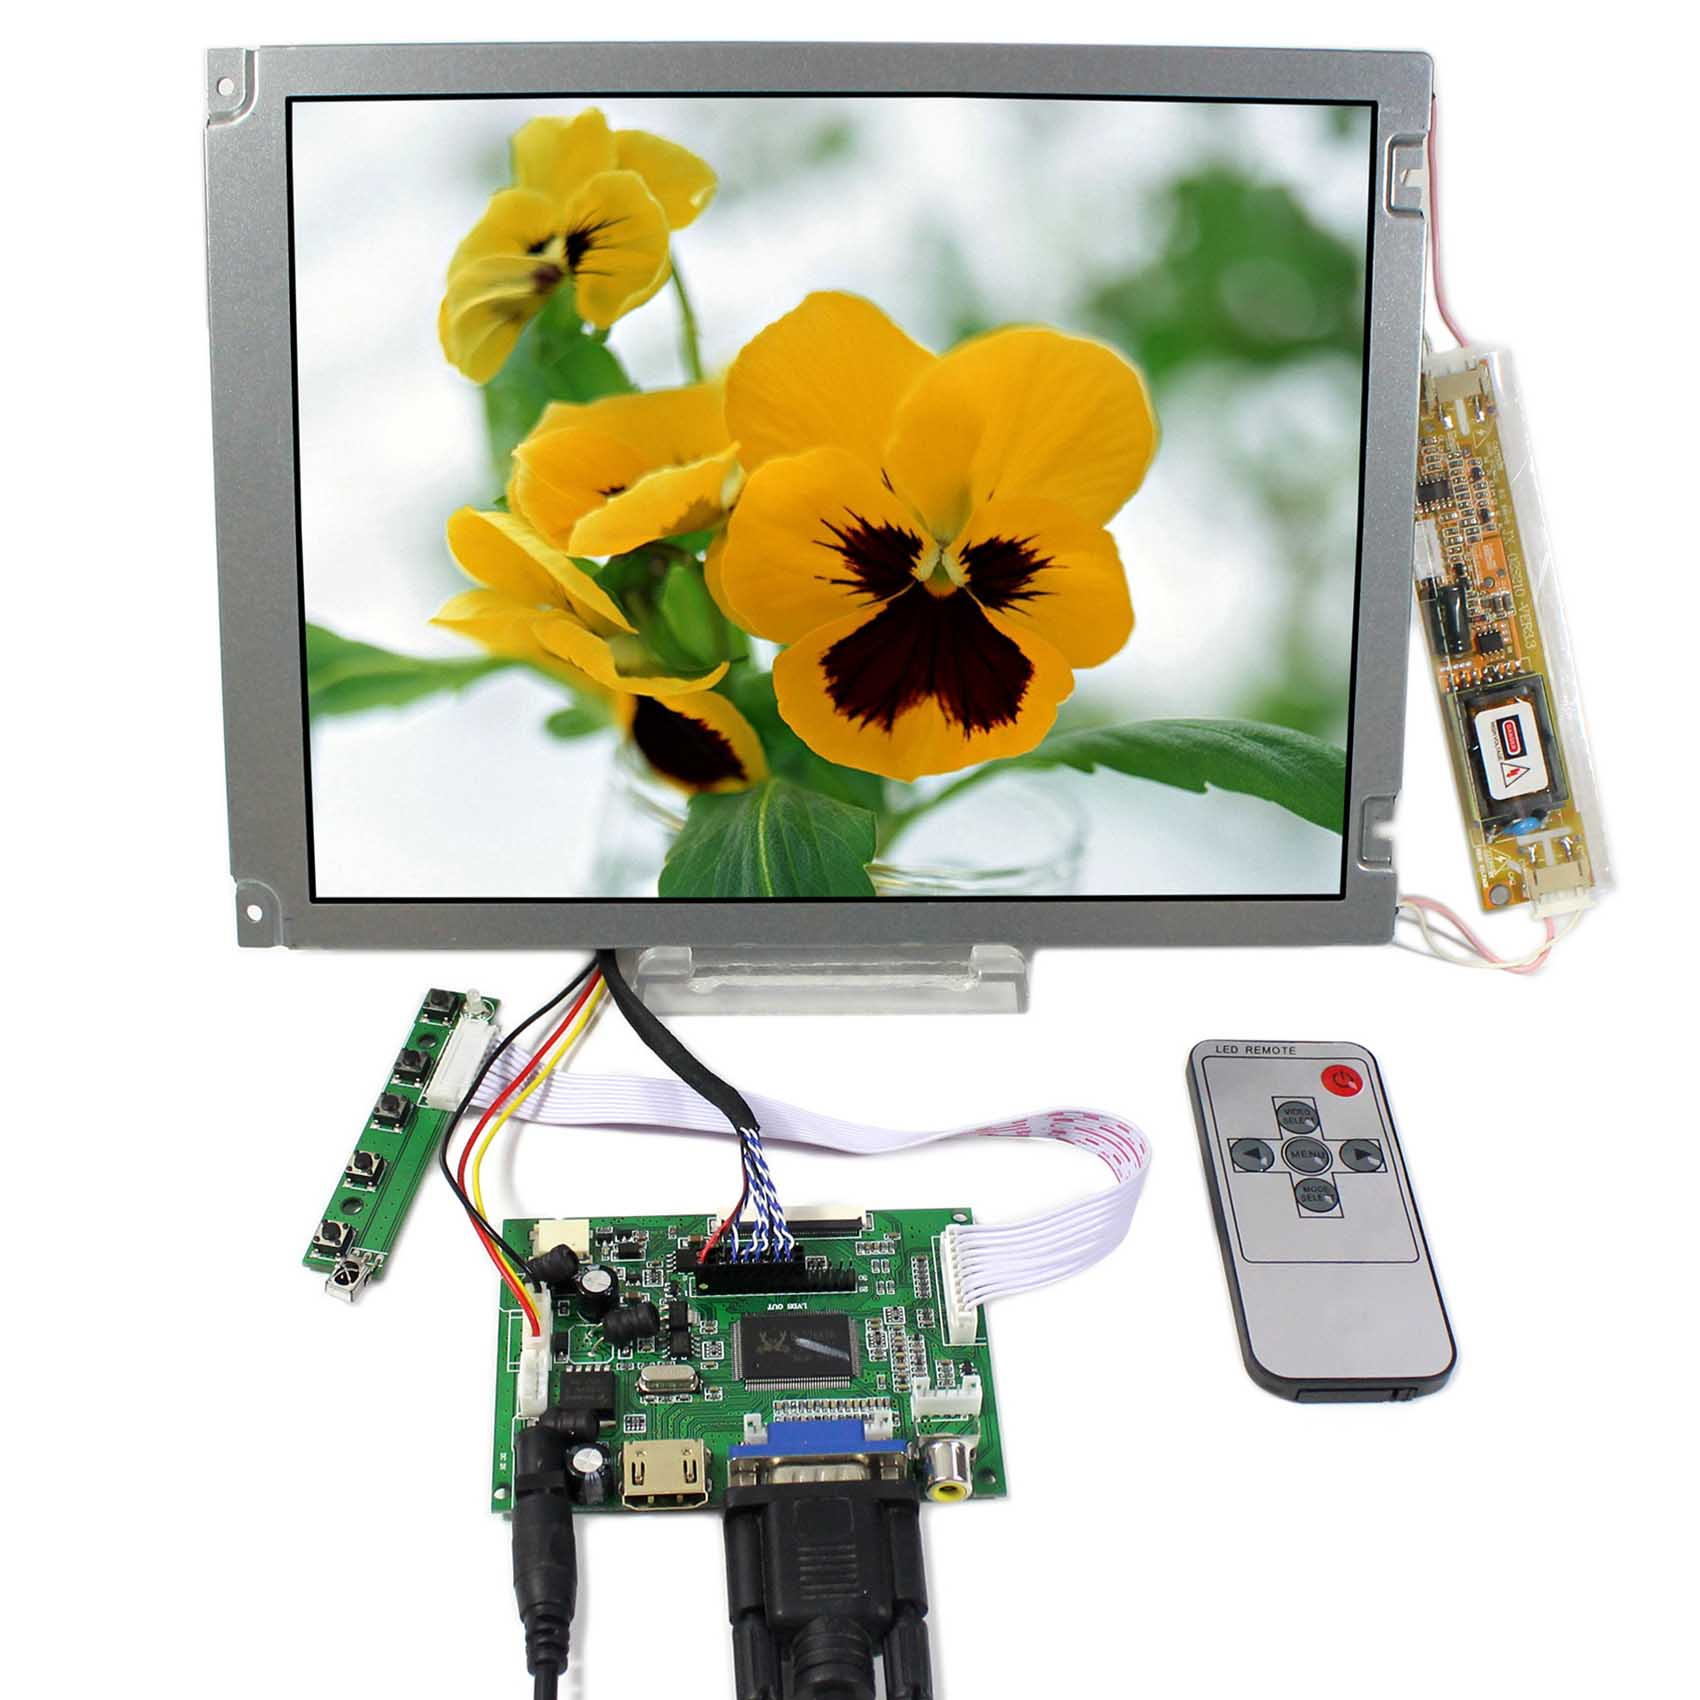 10.4inch AA104SG04 800x600 LCD Screen With HDMI VGA 2AV LCD LCD Controller Board VS-TY2662-V1 hdmi vga av audio lcd controller board kyv n3 v1 10 4inch lsa40at9001 800x600 lcd panel